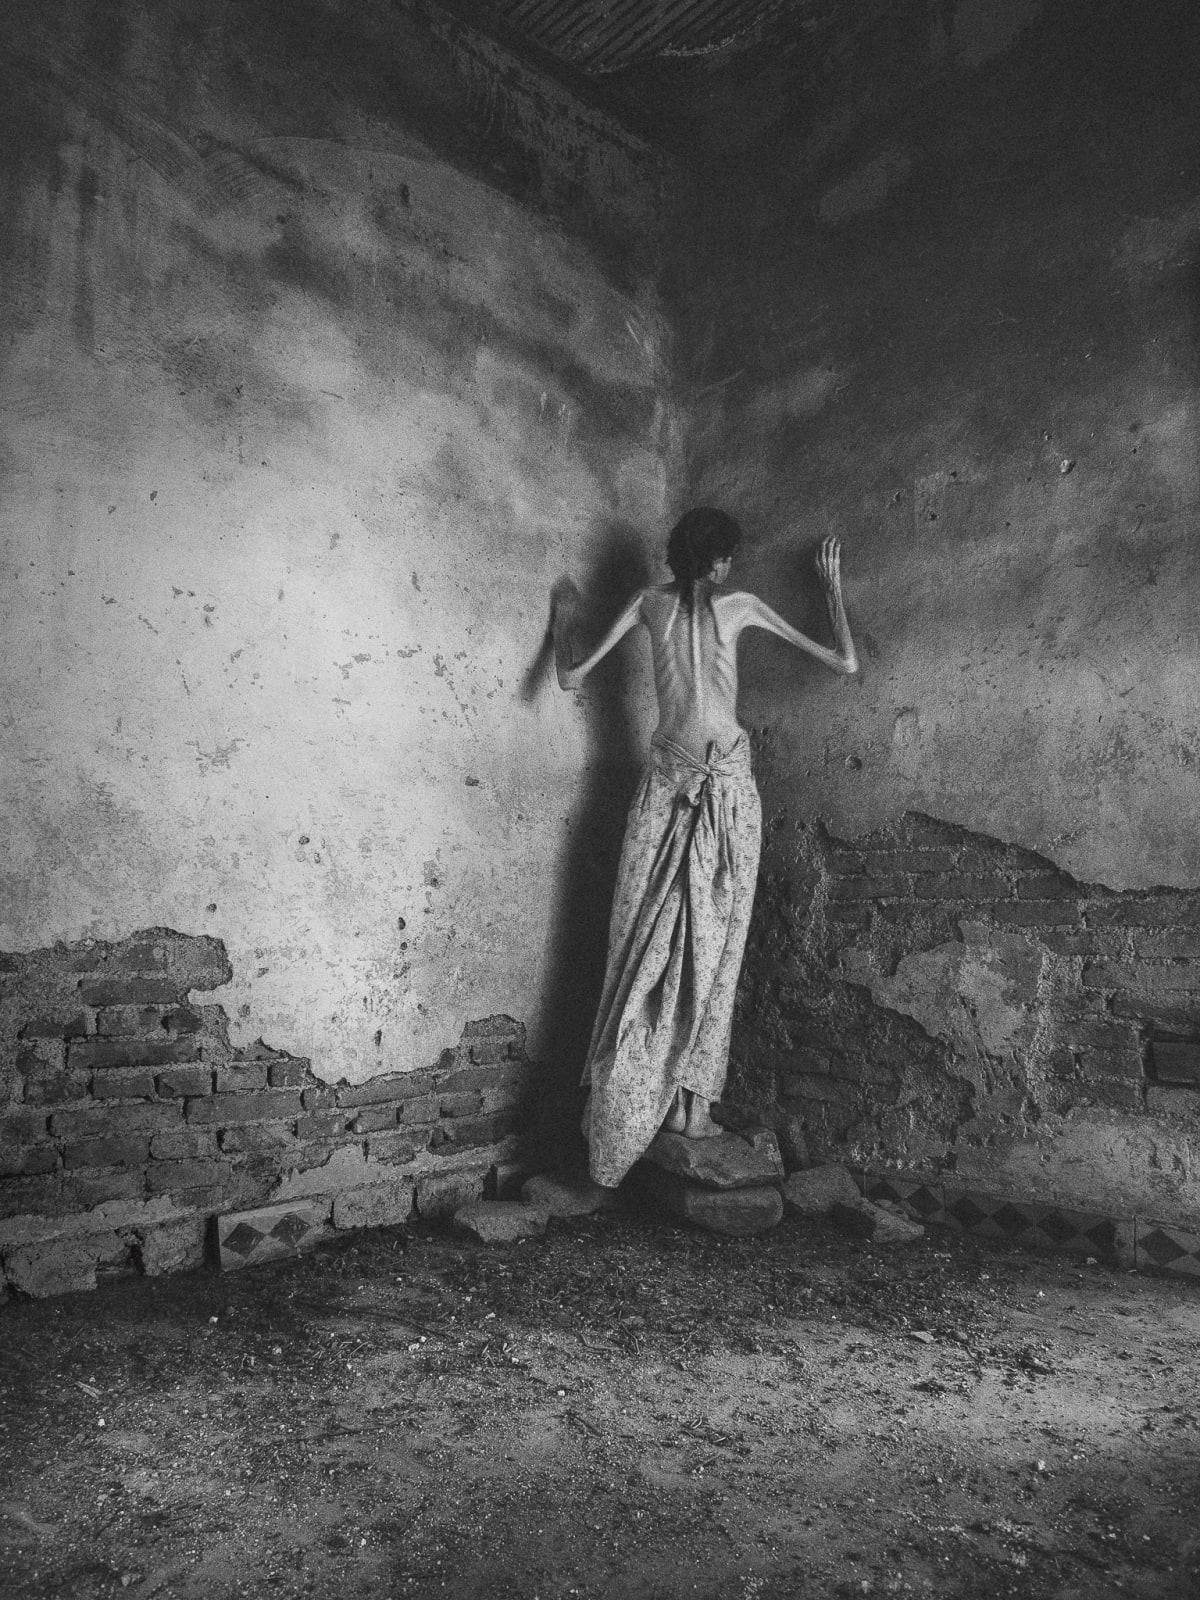 Lene Marie Fossen, Untitled Chios 8030330, 2017